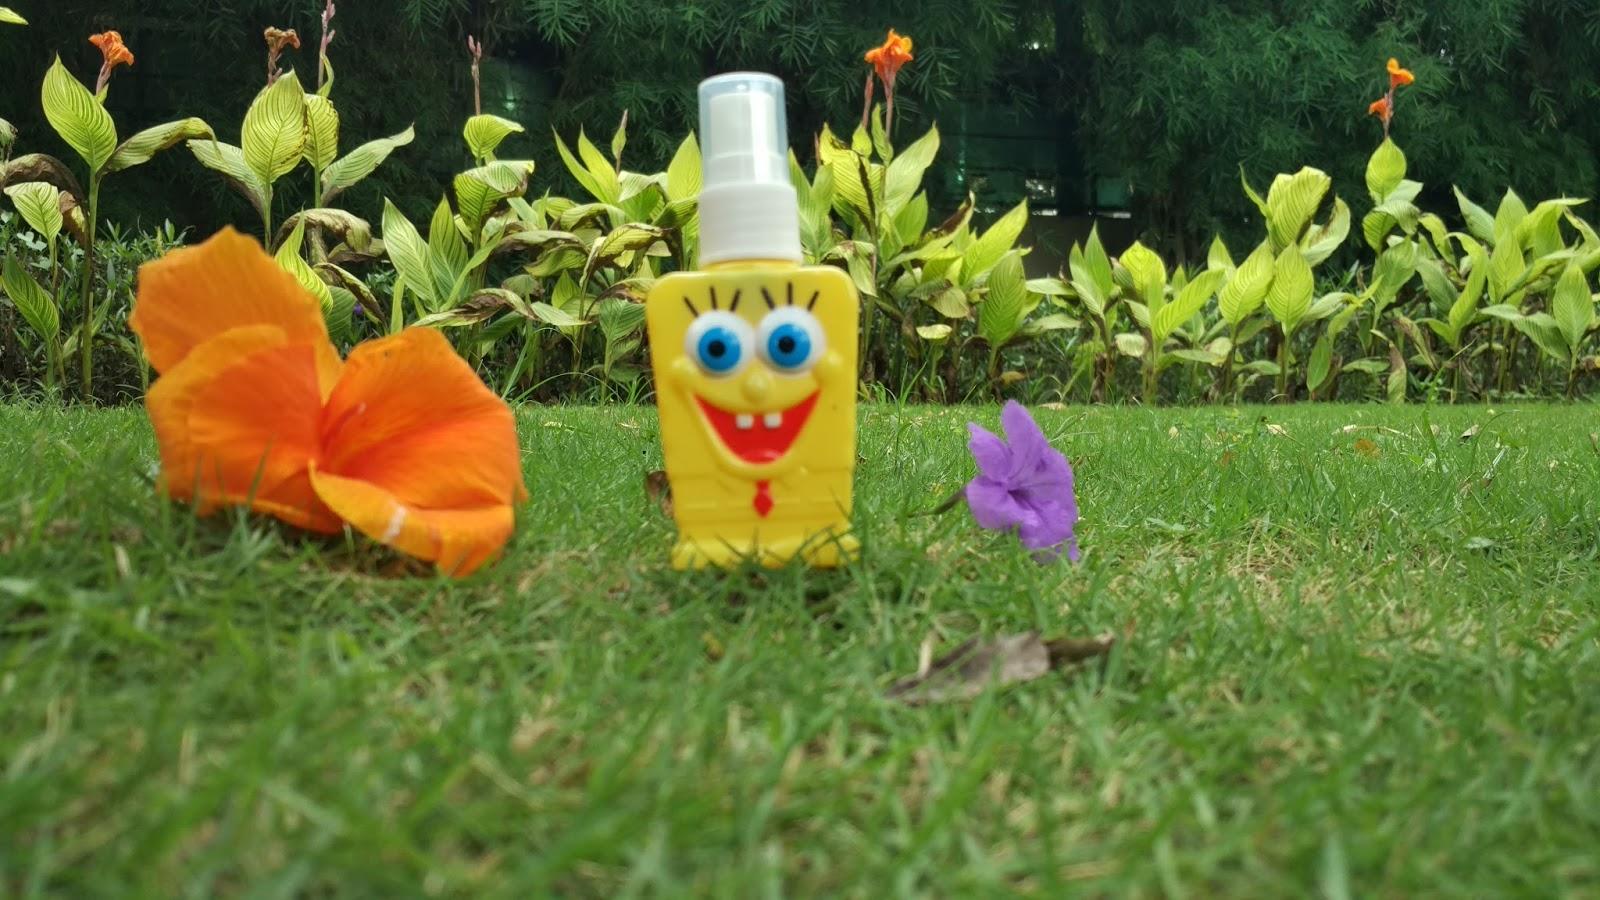 Botol Parfum Spongebob, botol parfum unik